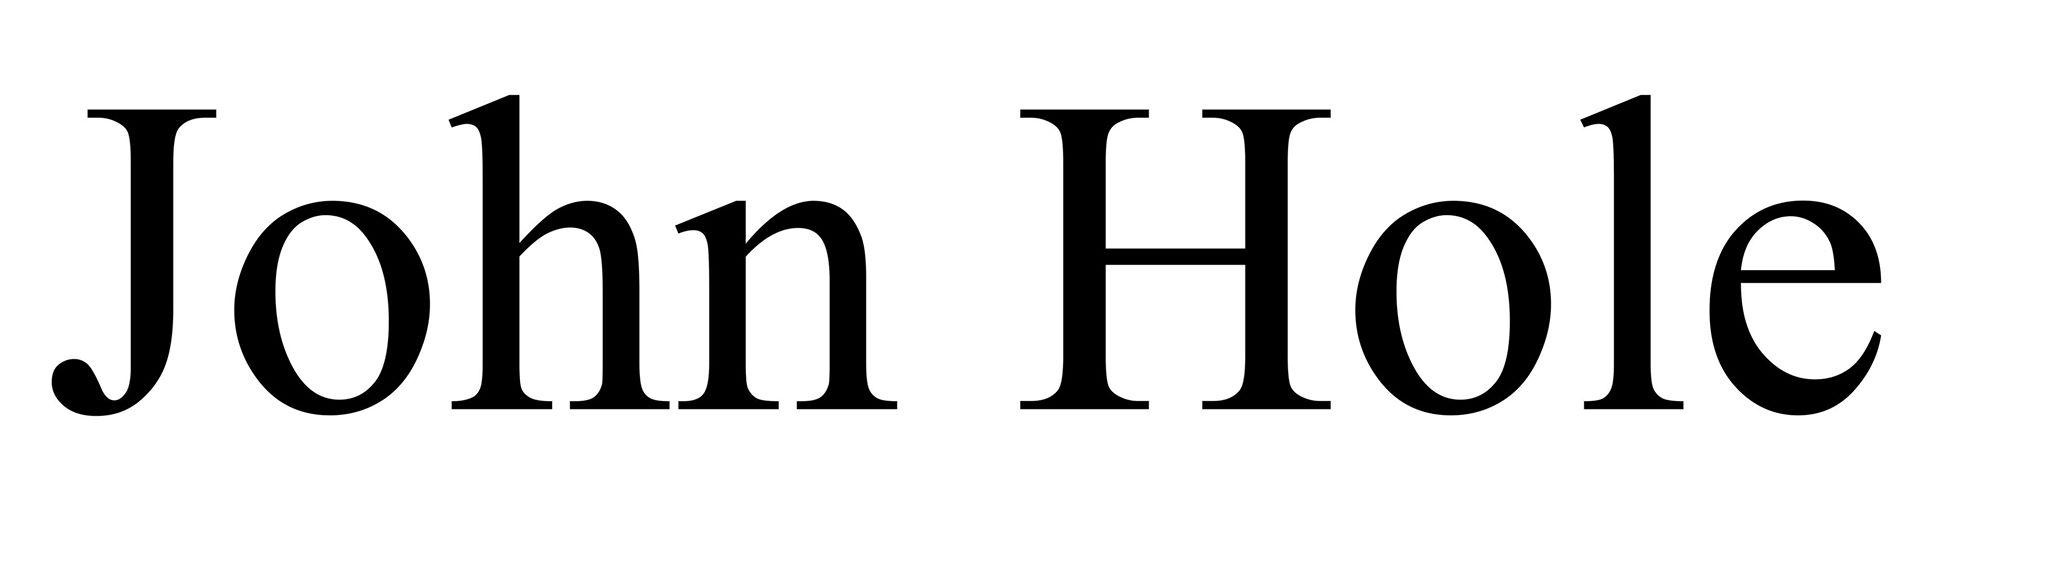 John Hole